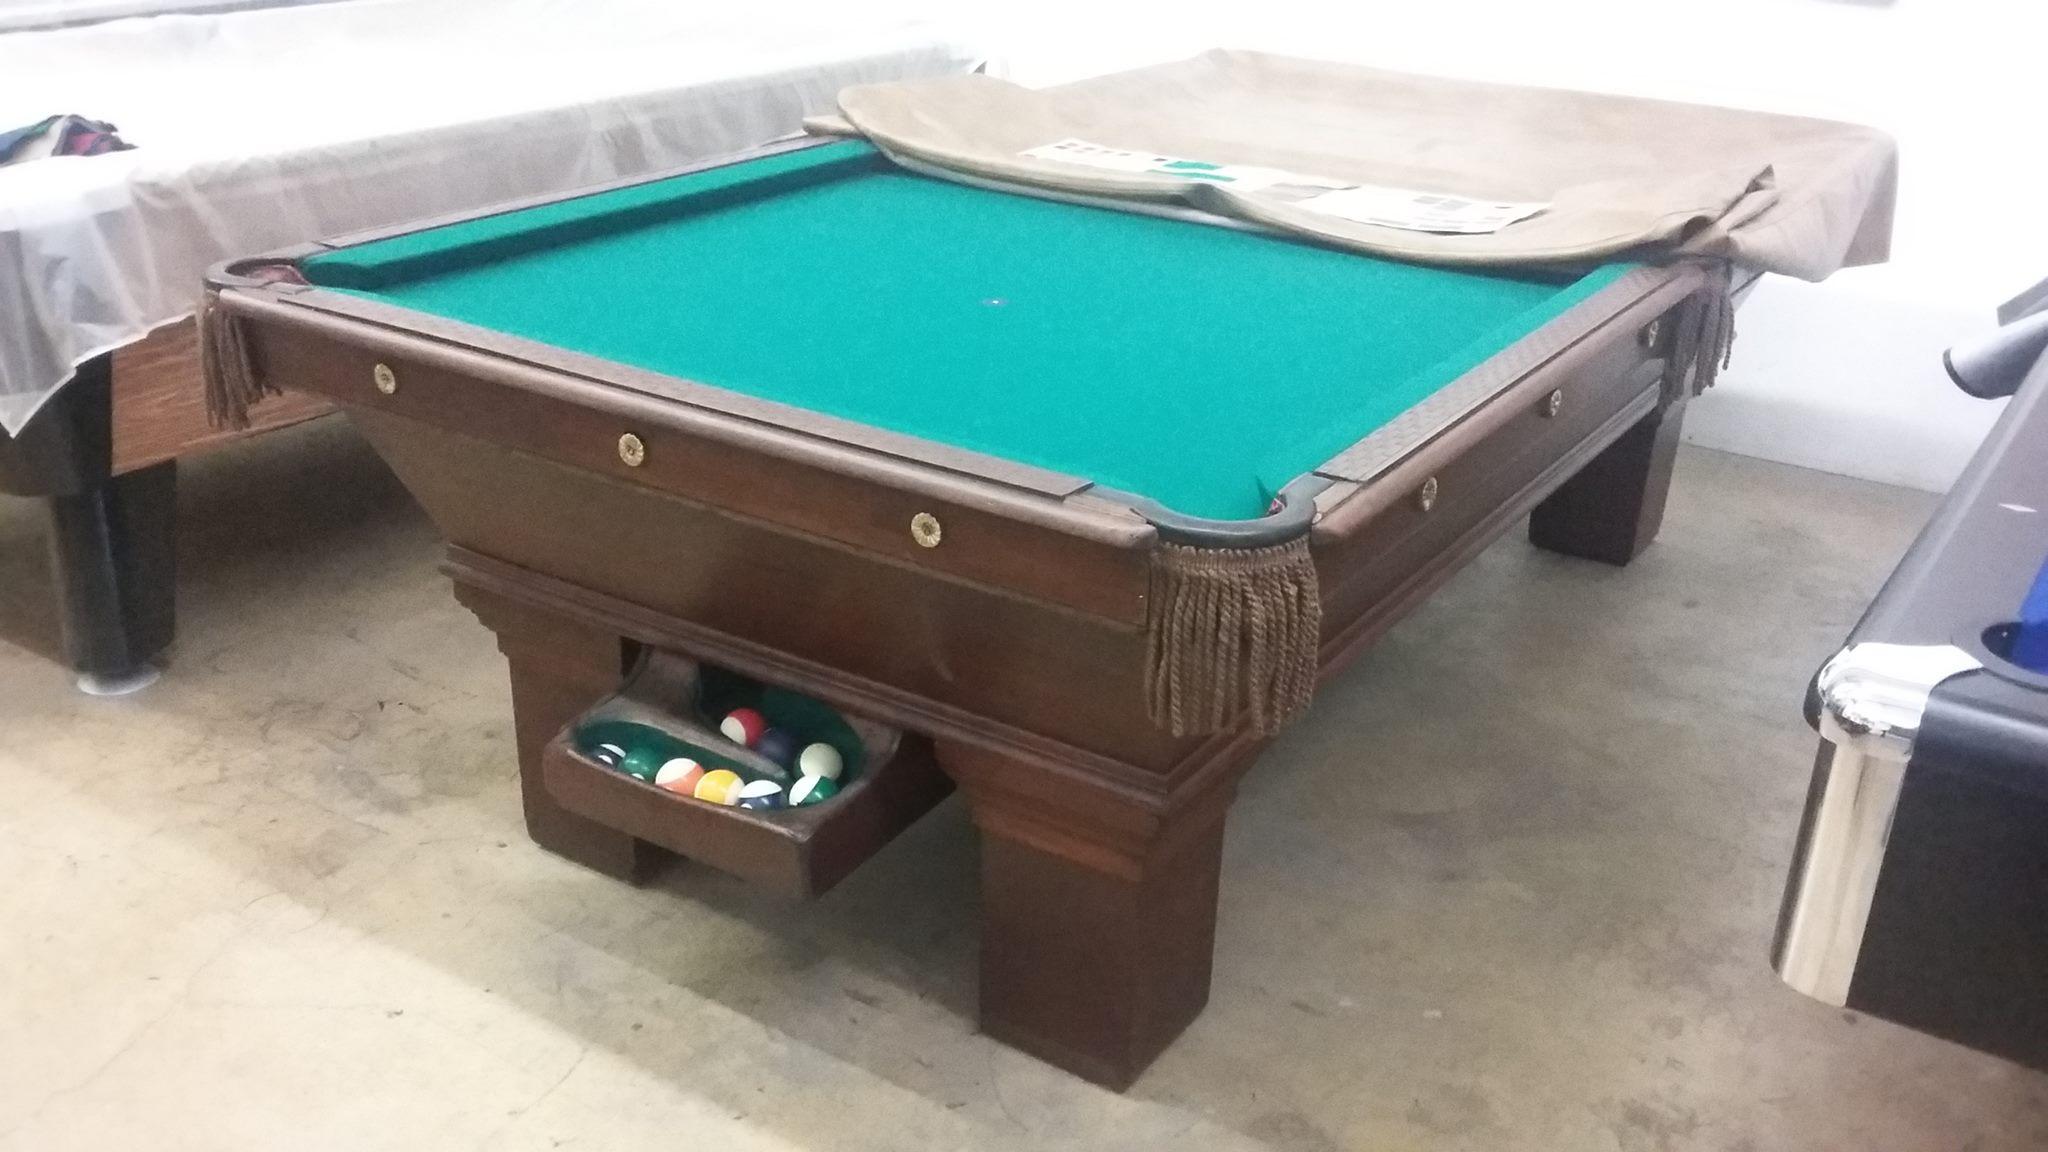 SOMAR BILLIARDS Used Pool Tables - Boessling pool table